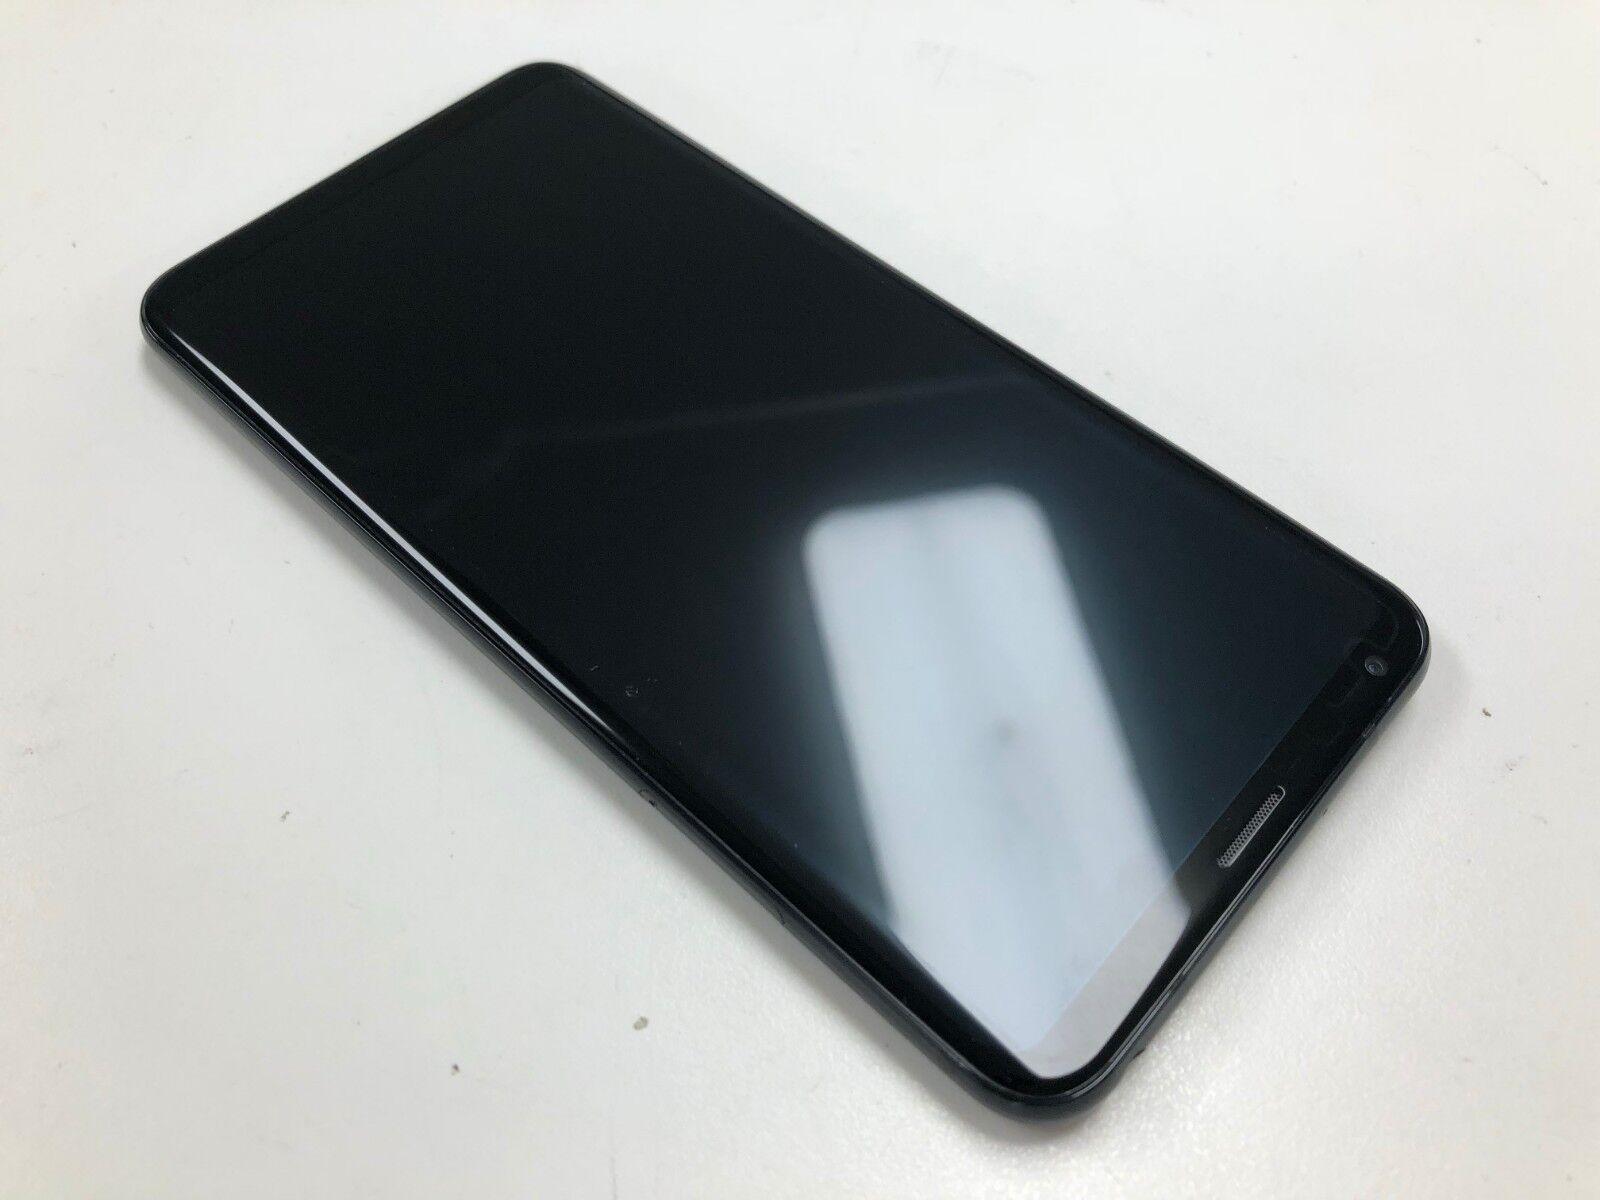 Android Phone - LG V30 US998- 128GB - Titan Black (Factory Unlocked) Smartphone 9/10